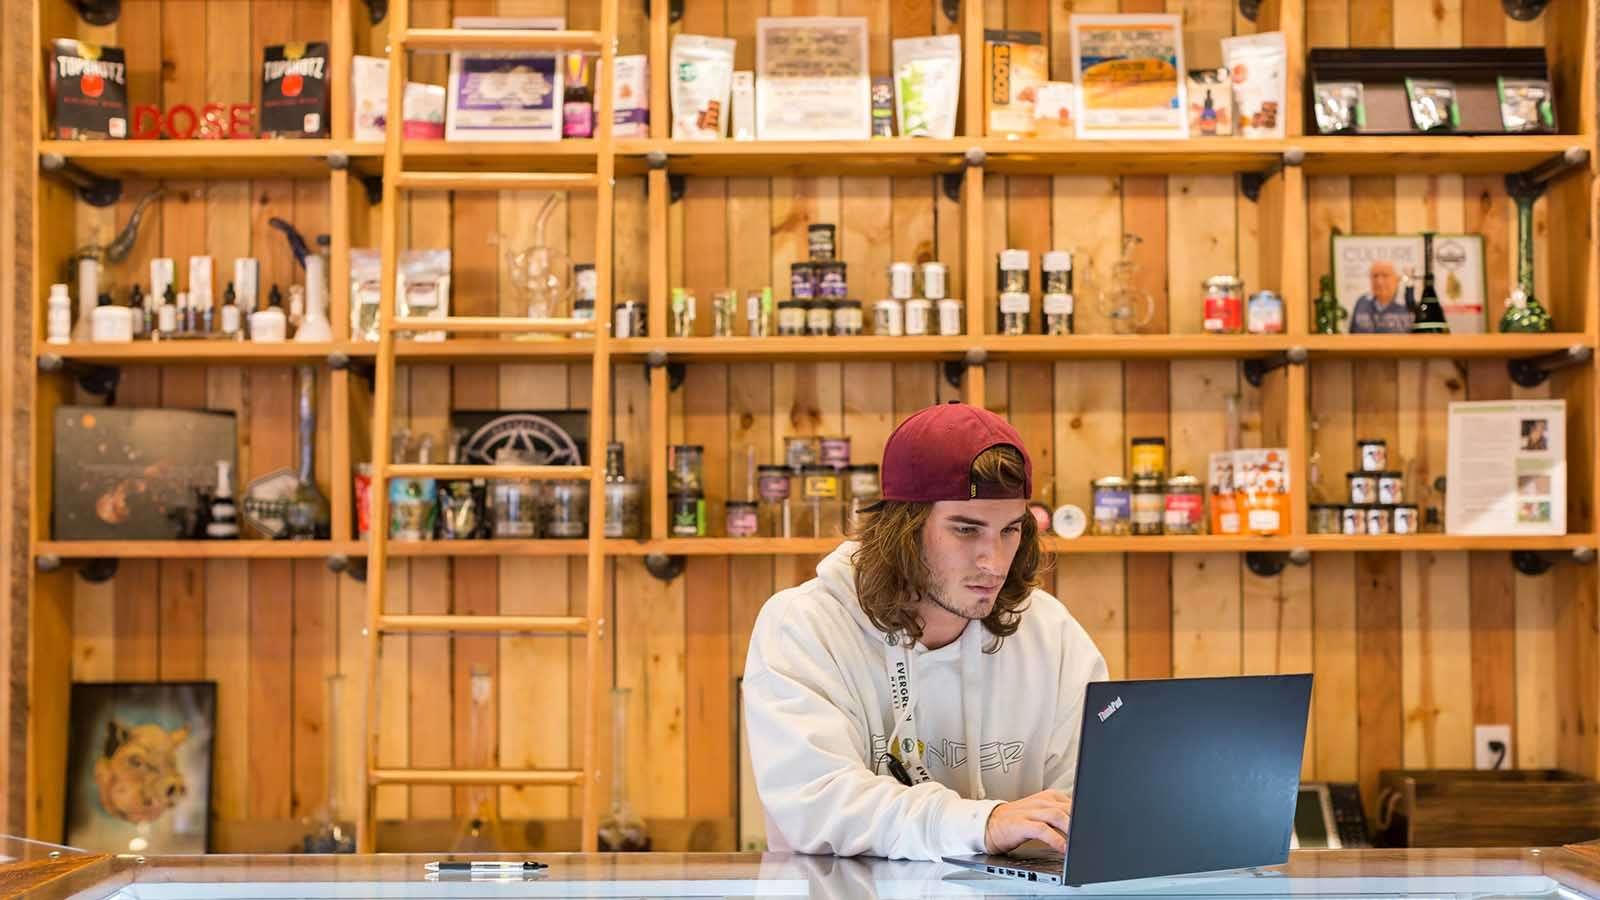 3 Ways to Maximize Cannabis Retail Sales on 4/20